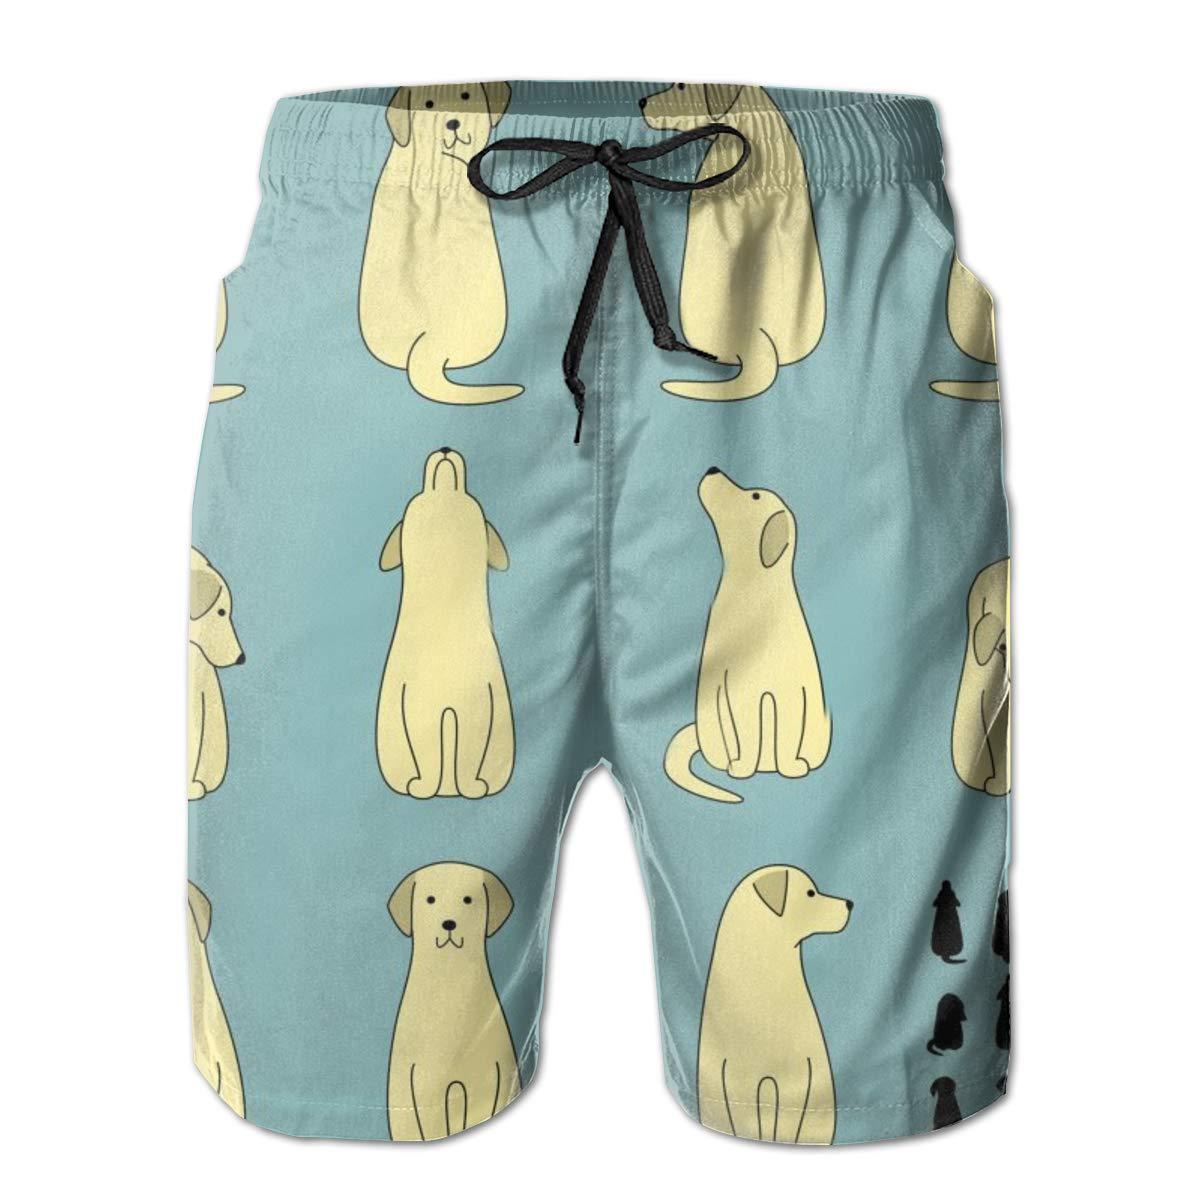 Pig Seamless Pattern Print Swim Trunks Summer Beach Shorts Pockets Boardshorts for Men